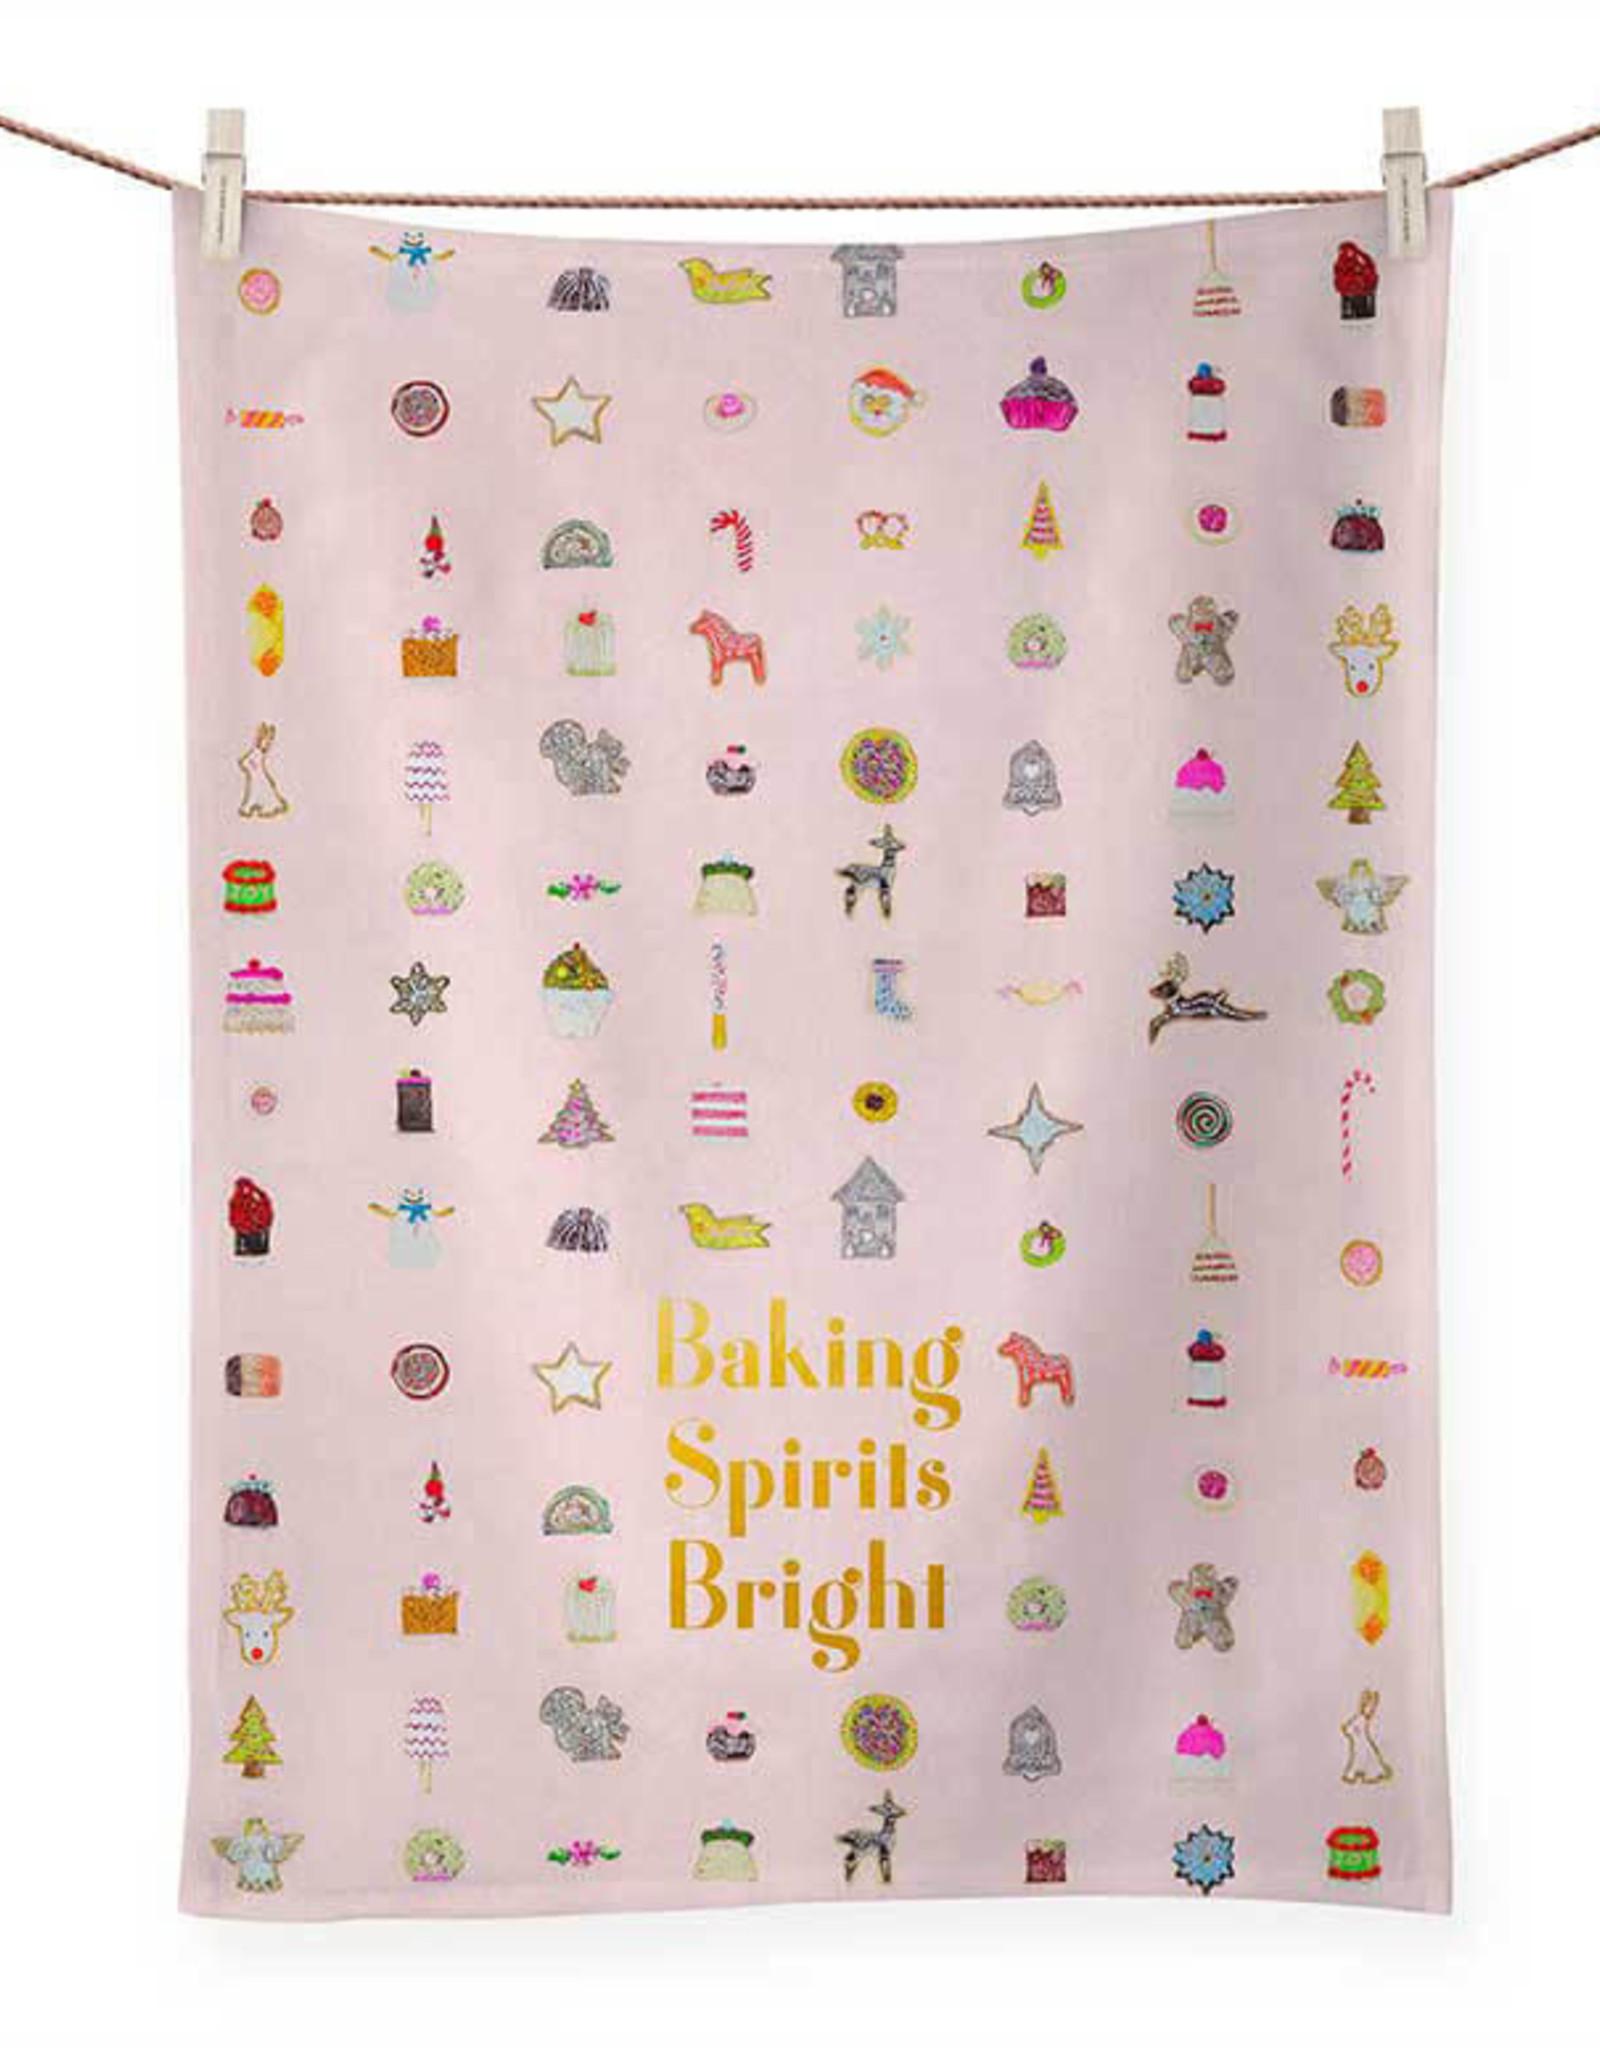 Greenbox Art Holiday - Baking Spirits Bright Tea Towel